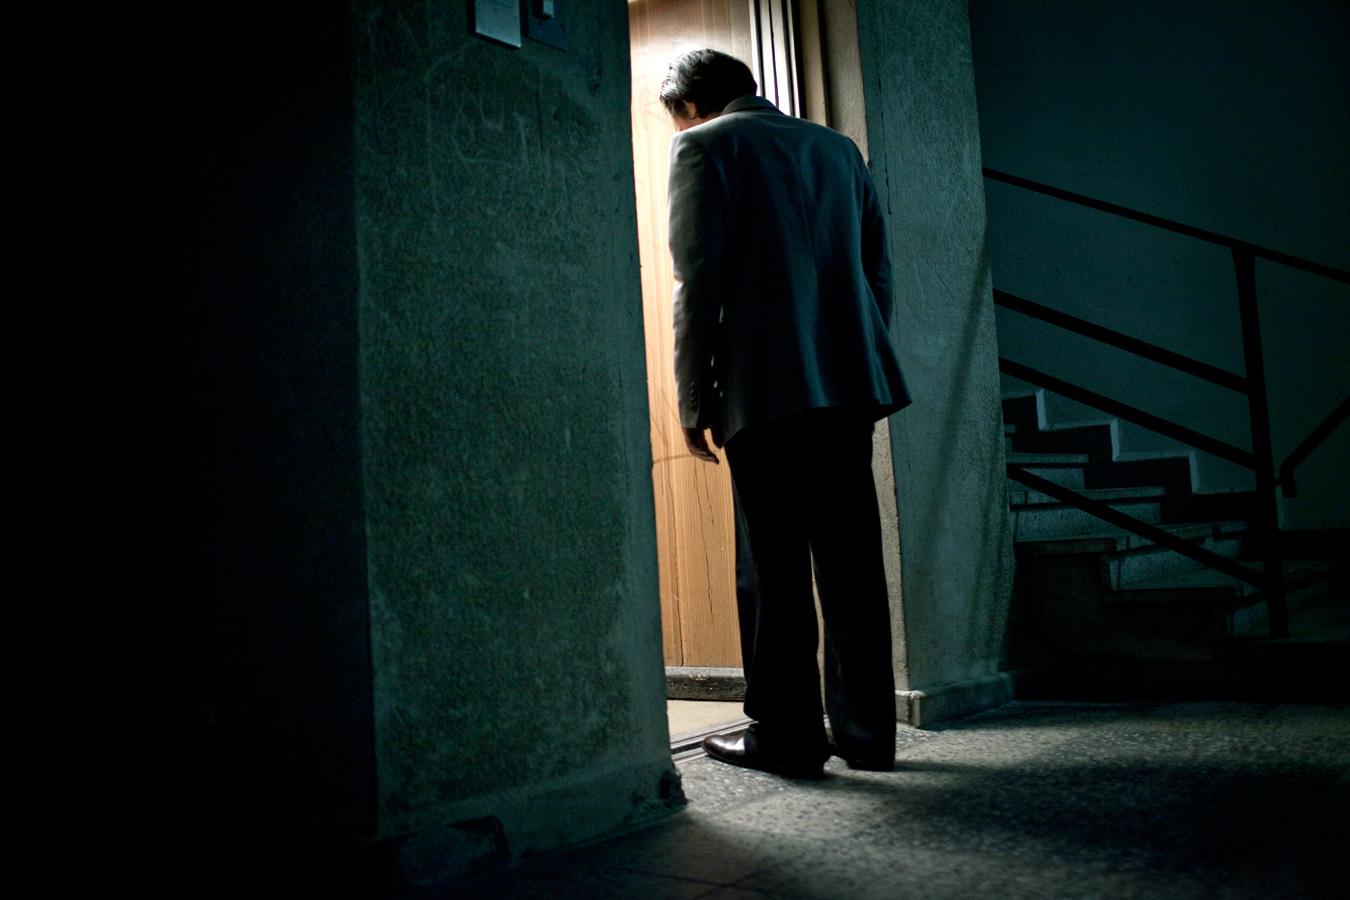 Лифты Мурманска закроют на ремонт